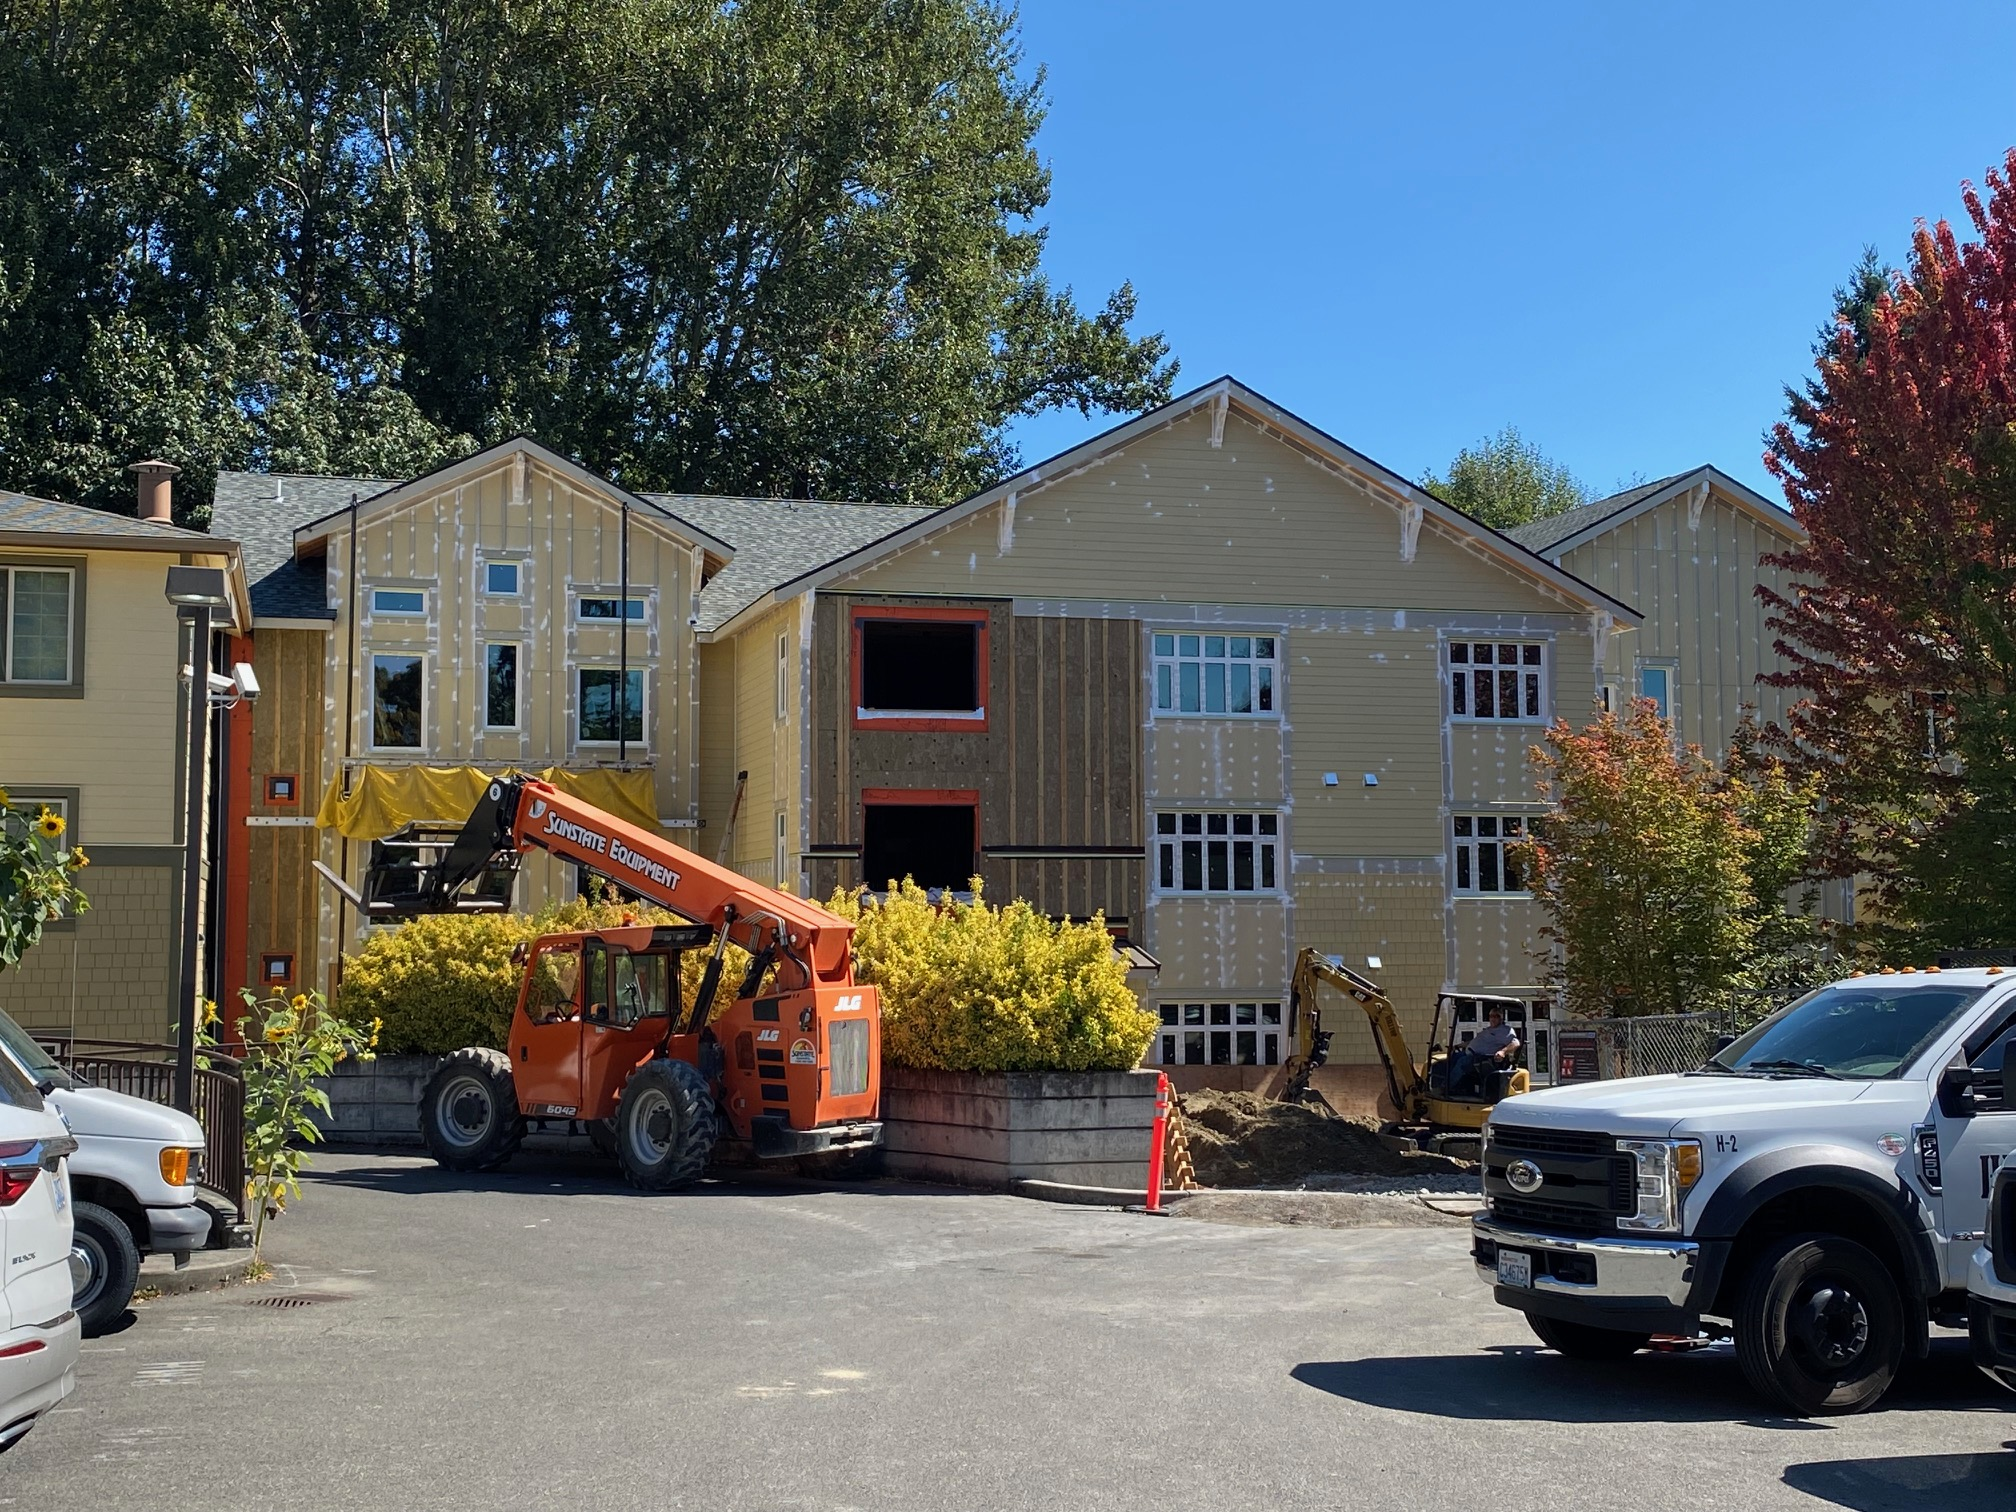 House construction picture